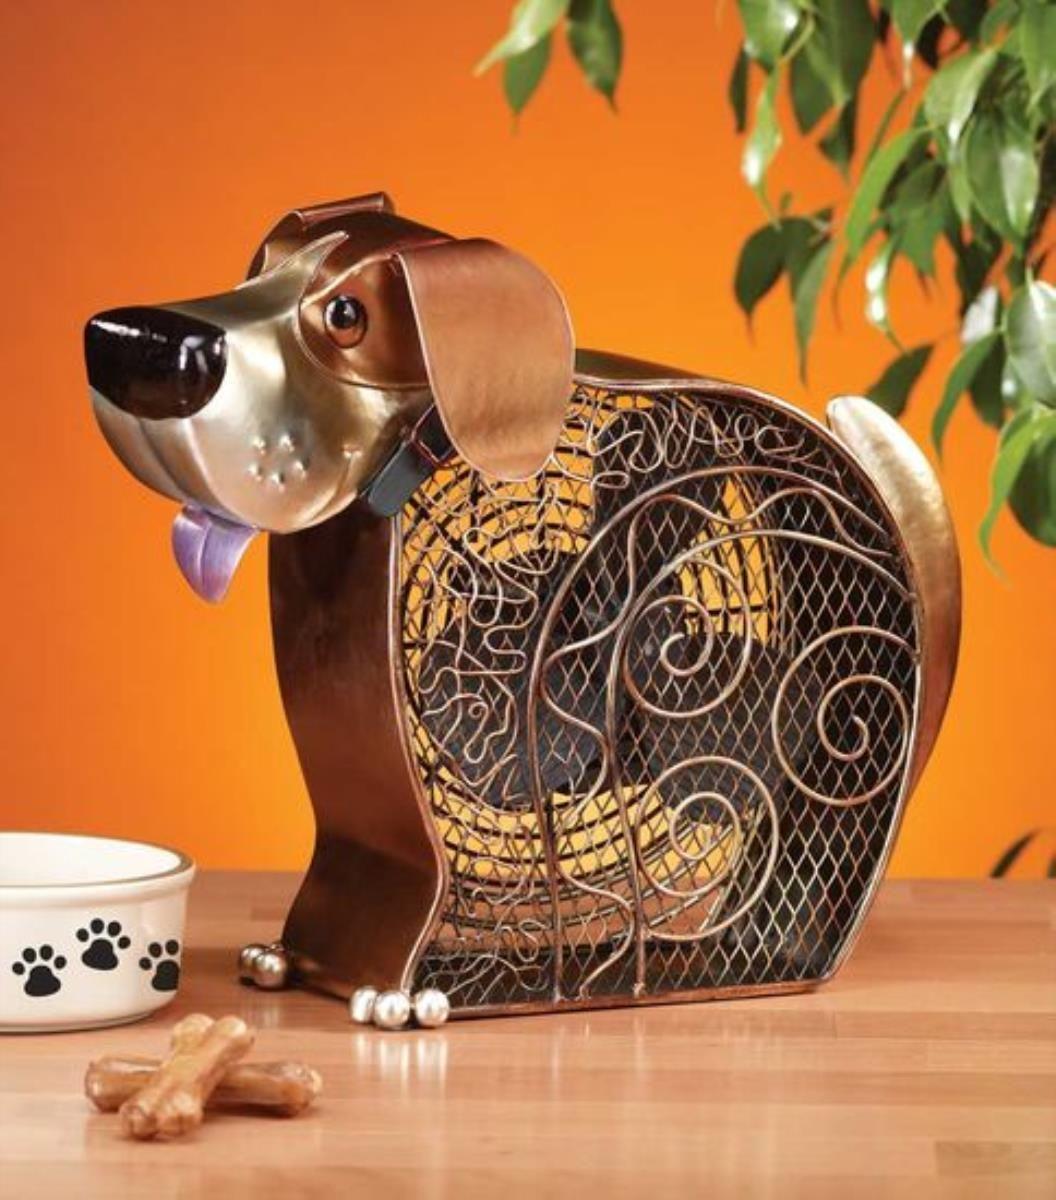 The Deco Breeze Dbf0264 Doggie13 Inch Decorative Table Fan Offers Reliable Service And Gentle Breezes With The Copp Figurine Fan Deco Breeze Fan Fan Decoration